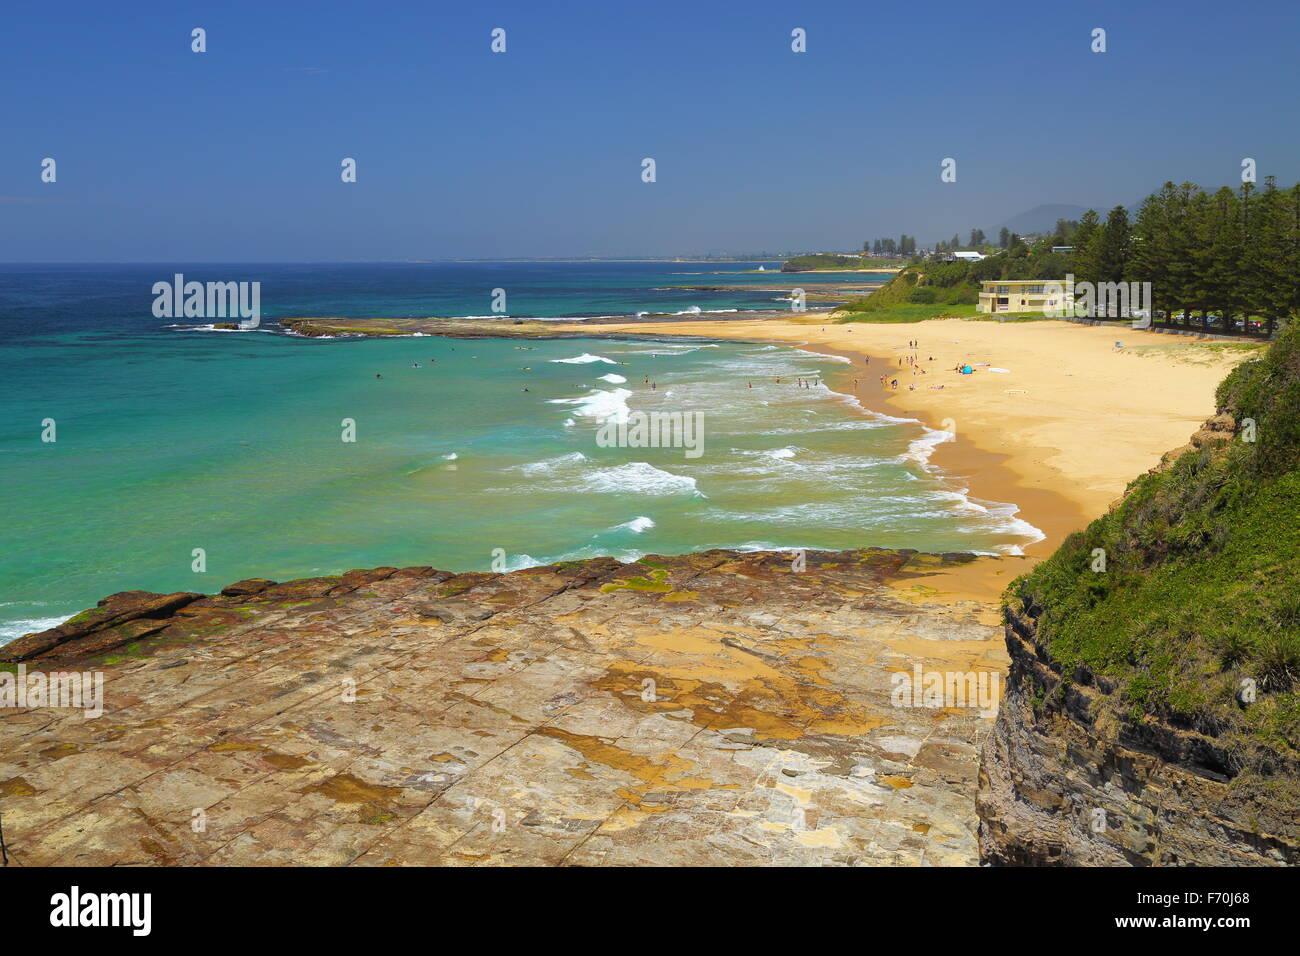 Coledale Beach and Surf Lifesaving Club - beachgoers enjoying  a glorious hot summer day in NSW, Australia. - Stock Image